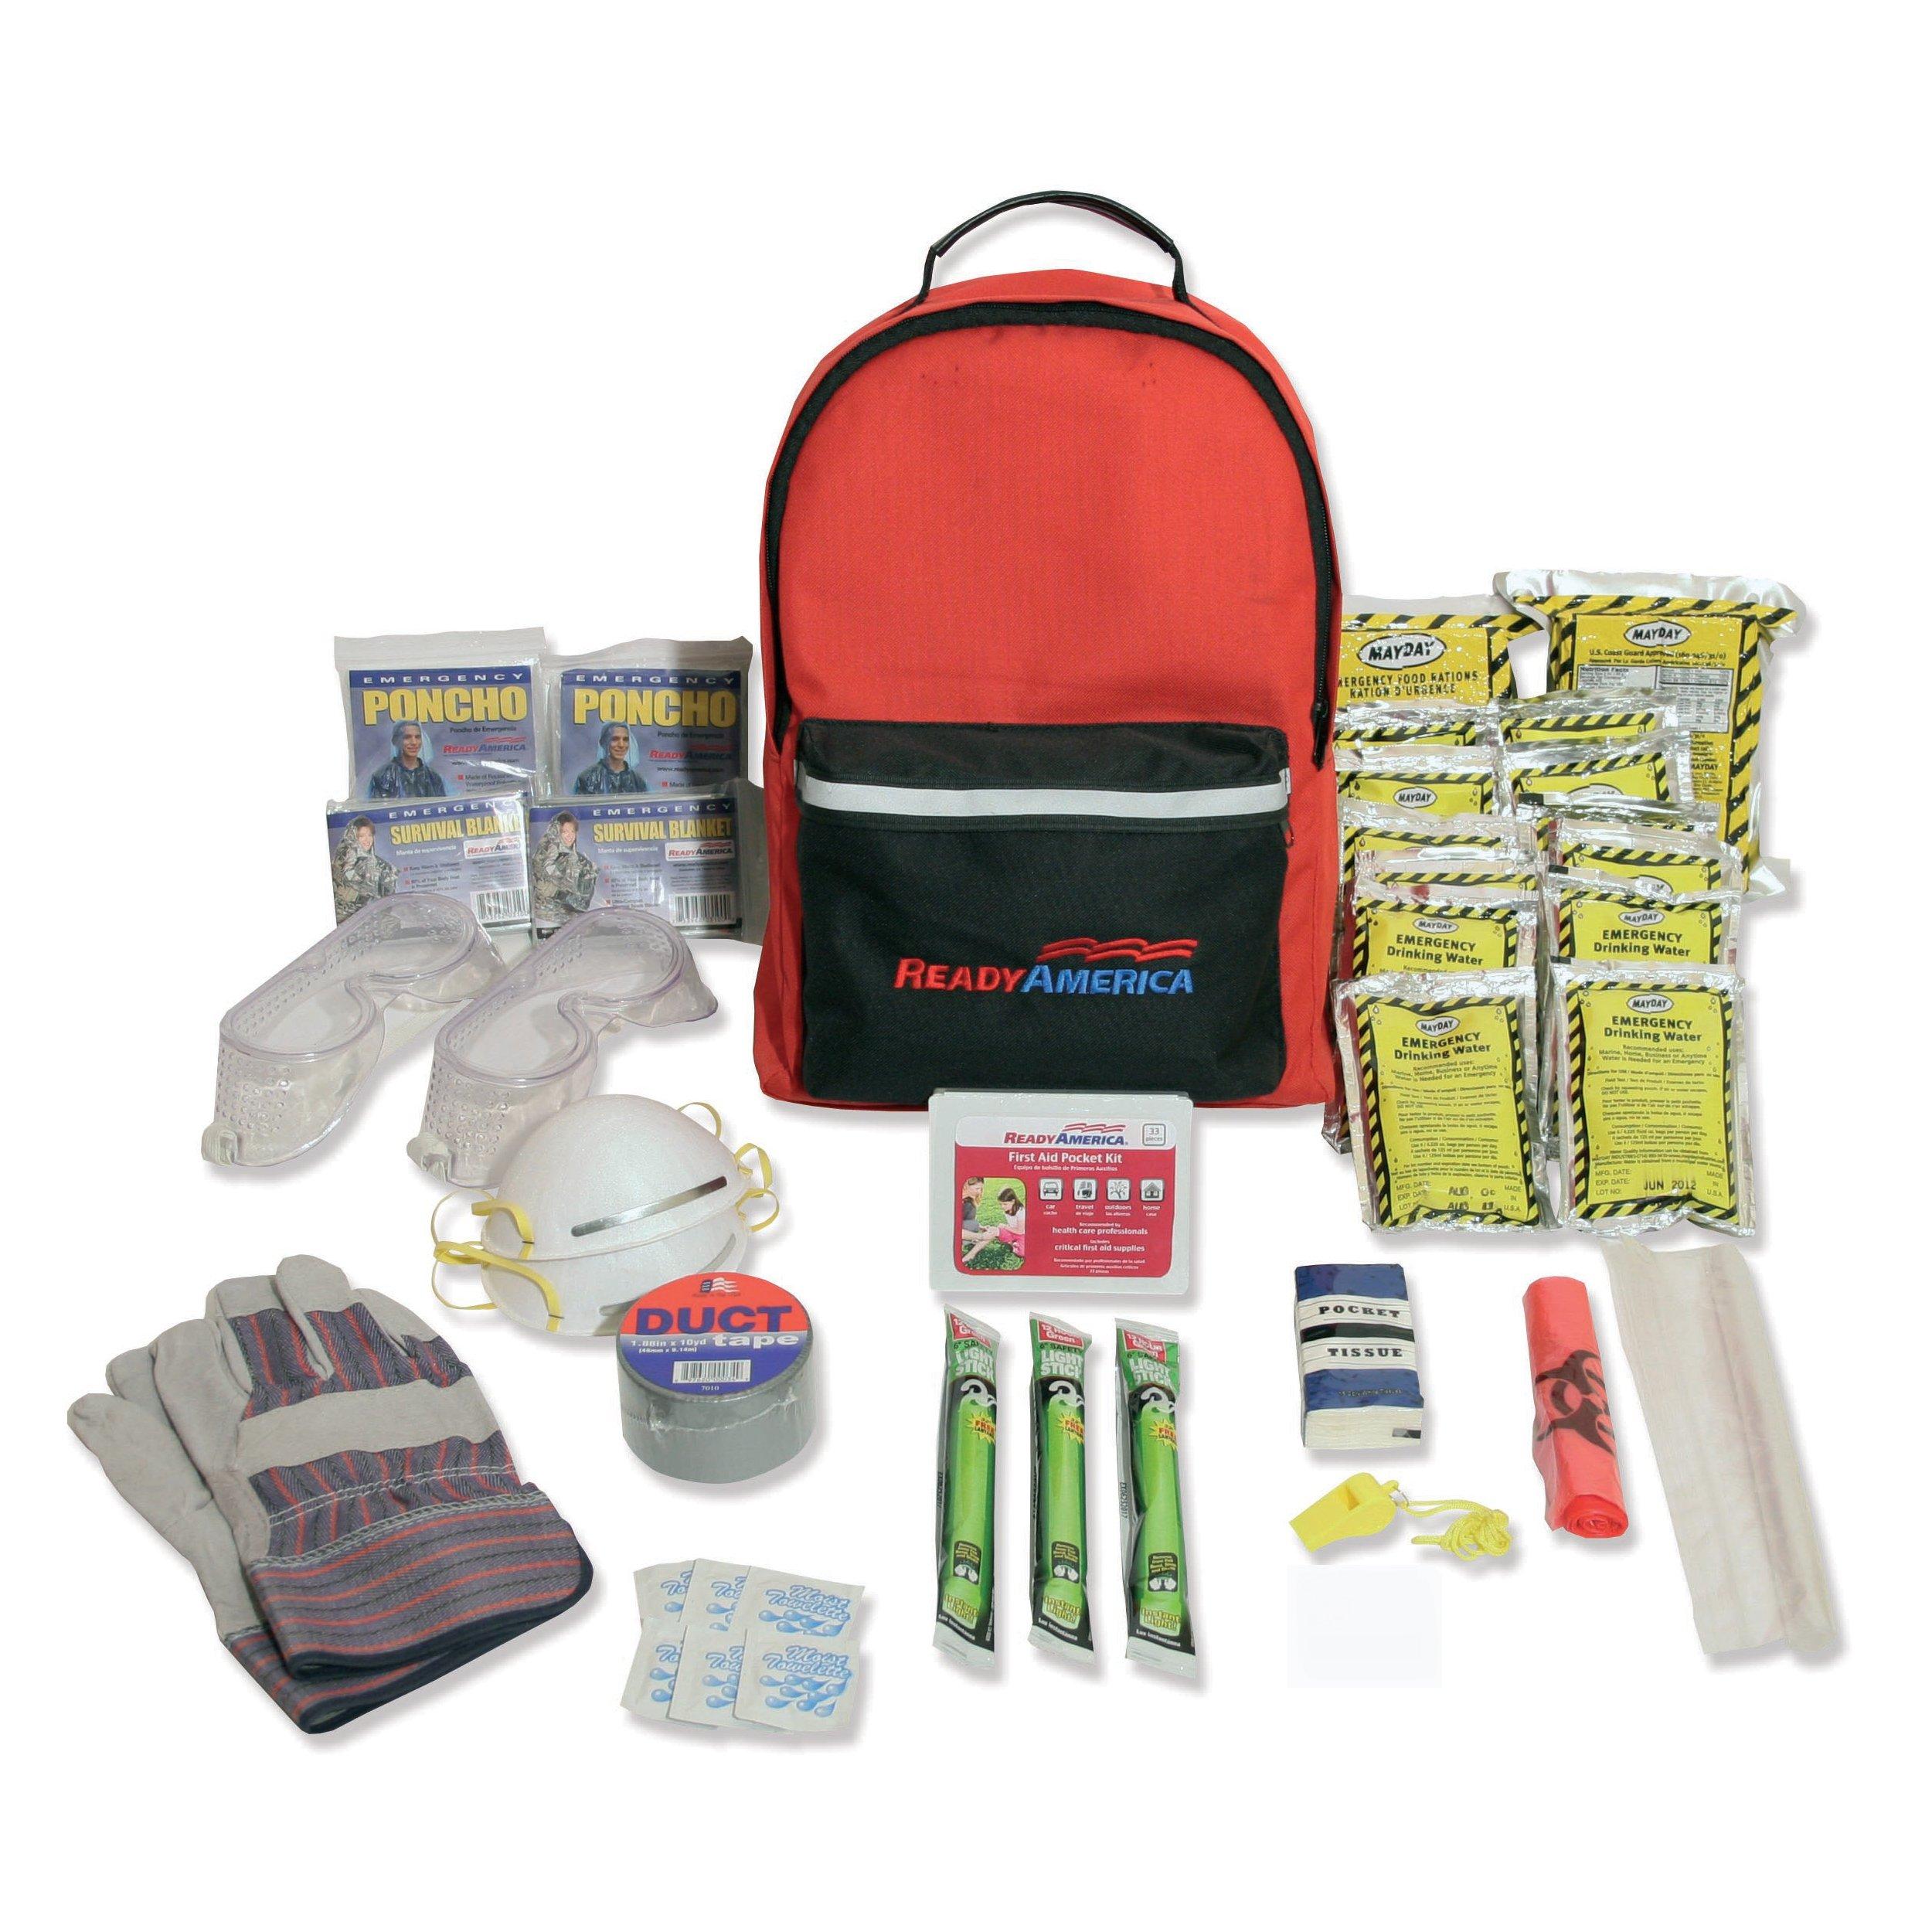 Ready America 70286 Hurricane Emergency Kit, 2 Person 3Day Backpack